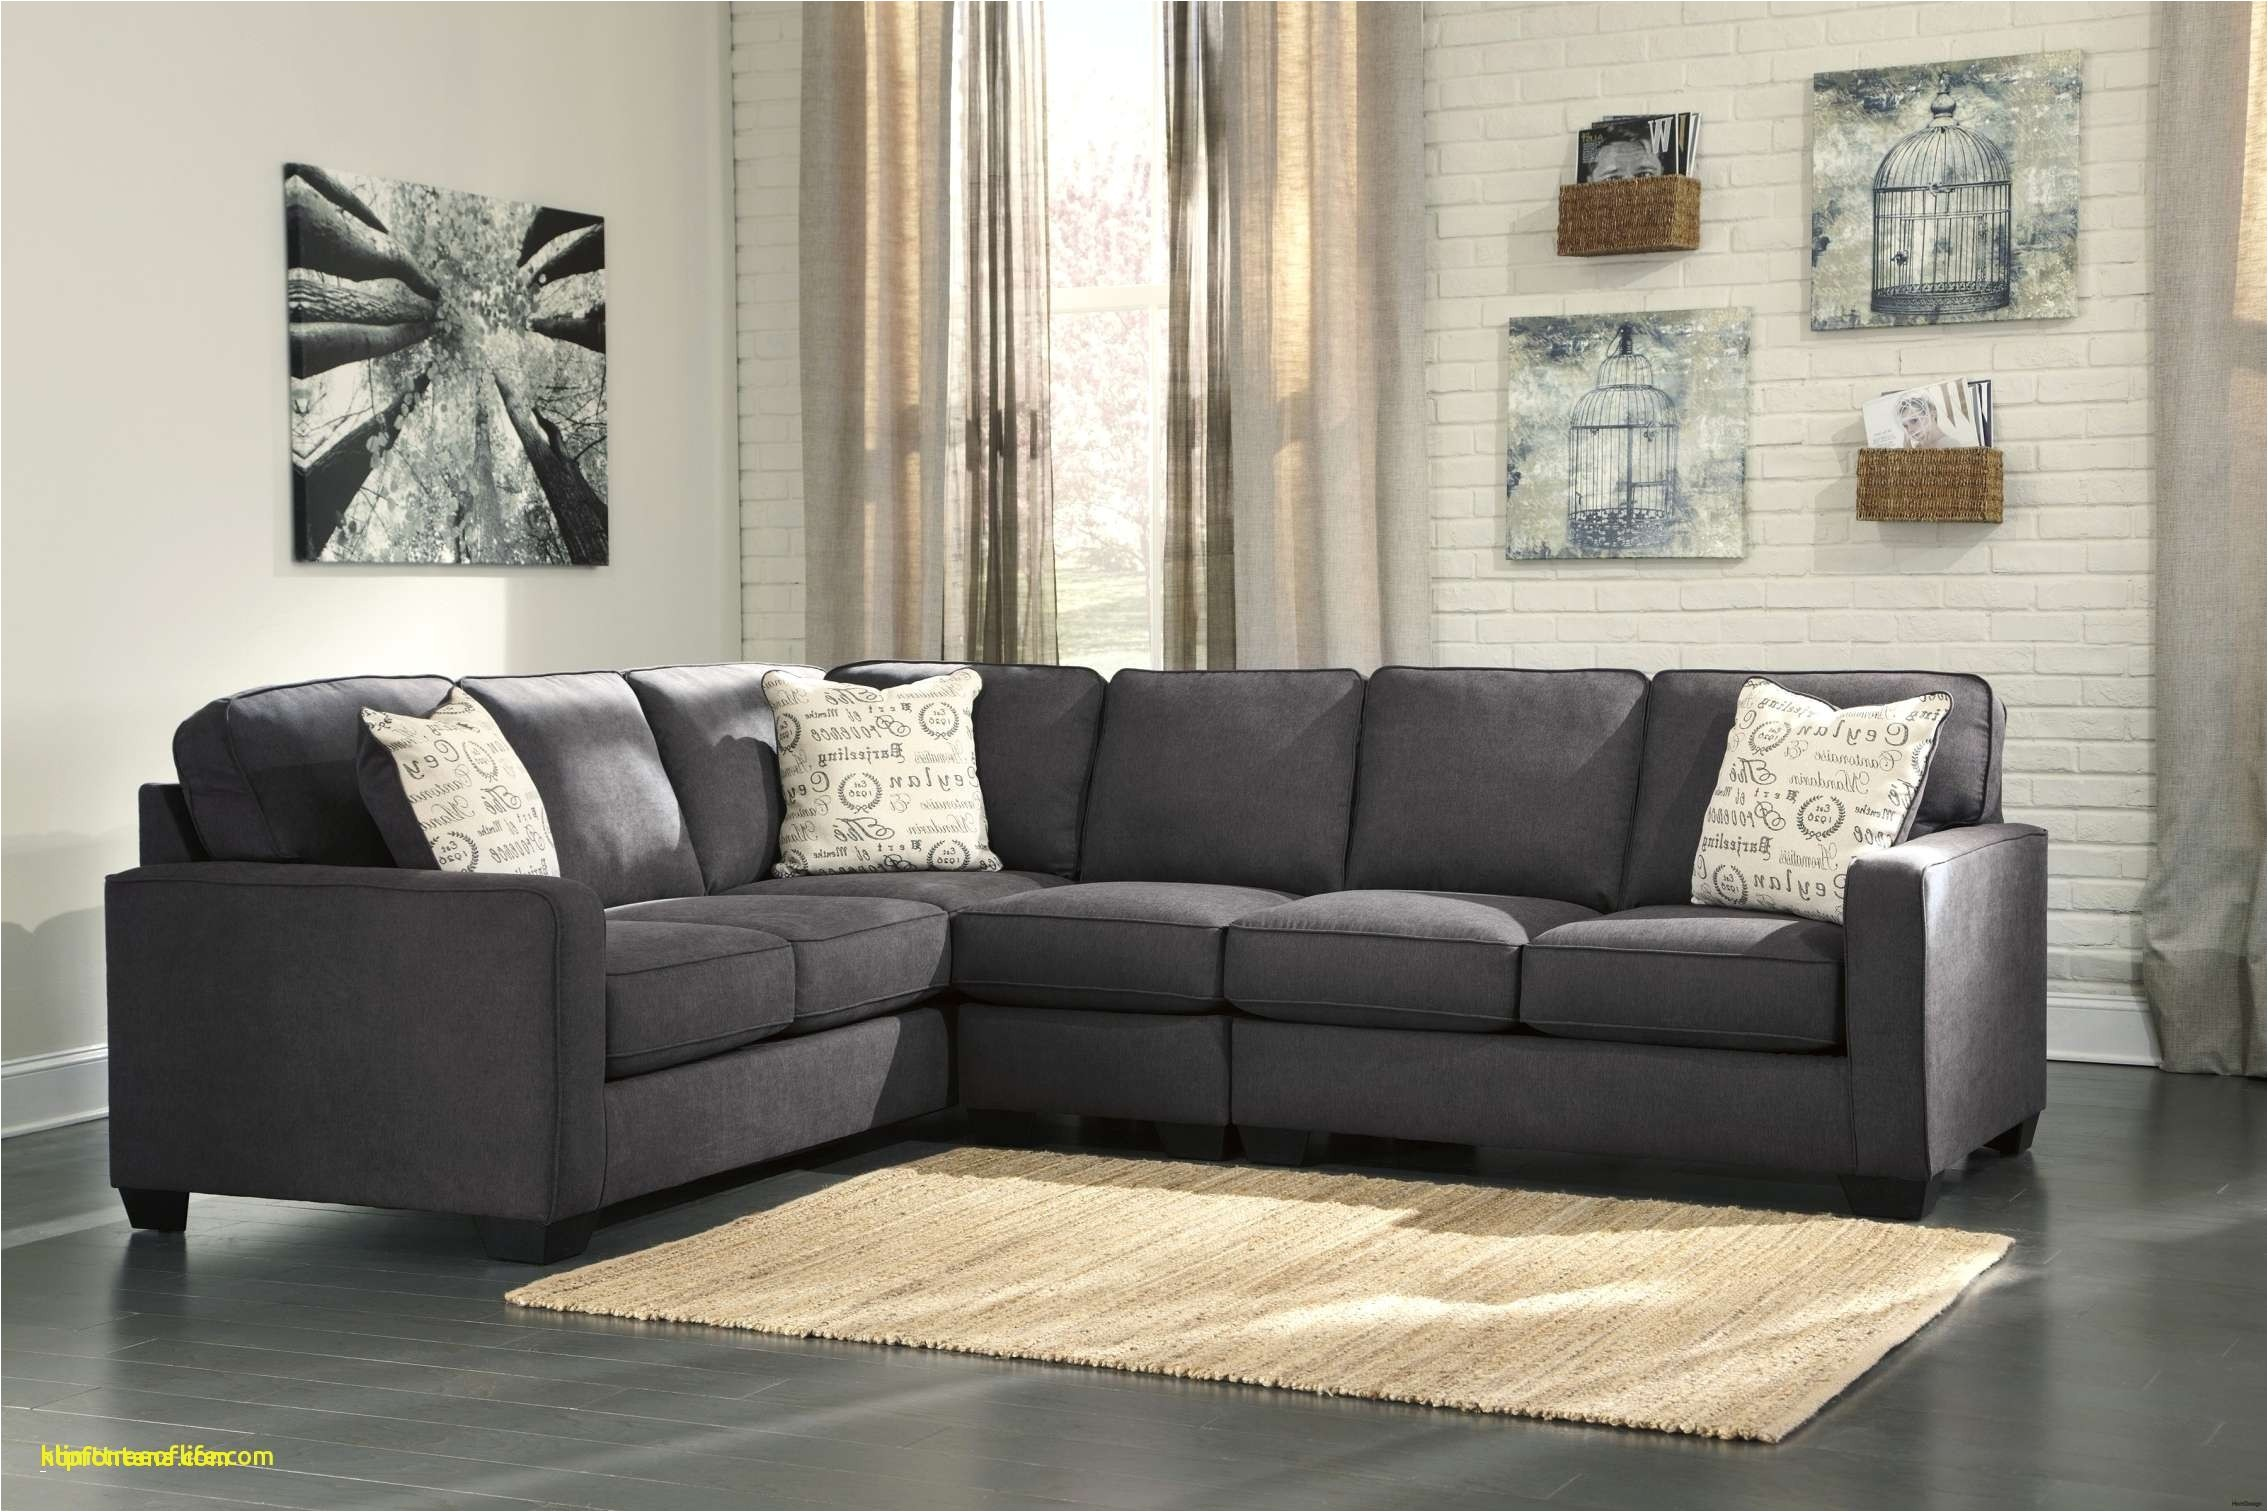 Modular Sectional Sofa For Small Spaces Inspirational Small Apartment  Sectional Sofa Designsolutions Usa